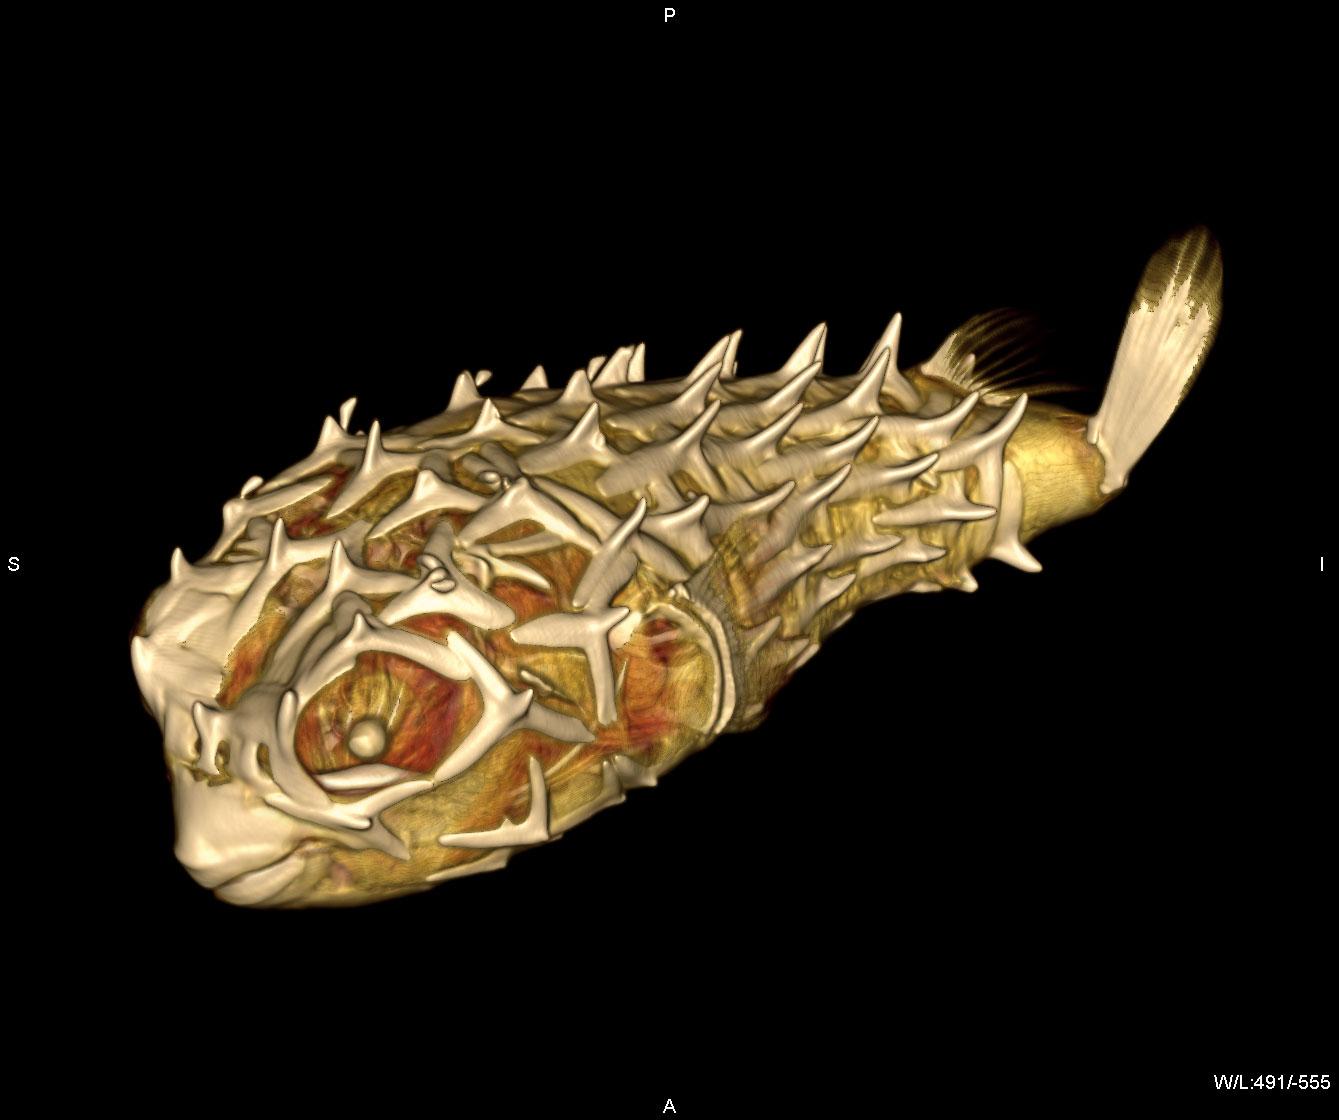 http://www.izw-berlin.de/tl_files/images/Services/CT/23_Porcupine%20fish%20%28Chilomycterus%20spec.%29.%20CT-image%20G.Fritsch%2C%20T.Hildebrandt.jpg